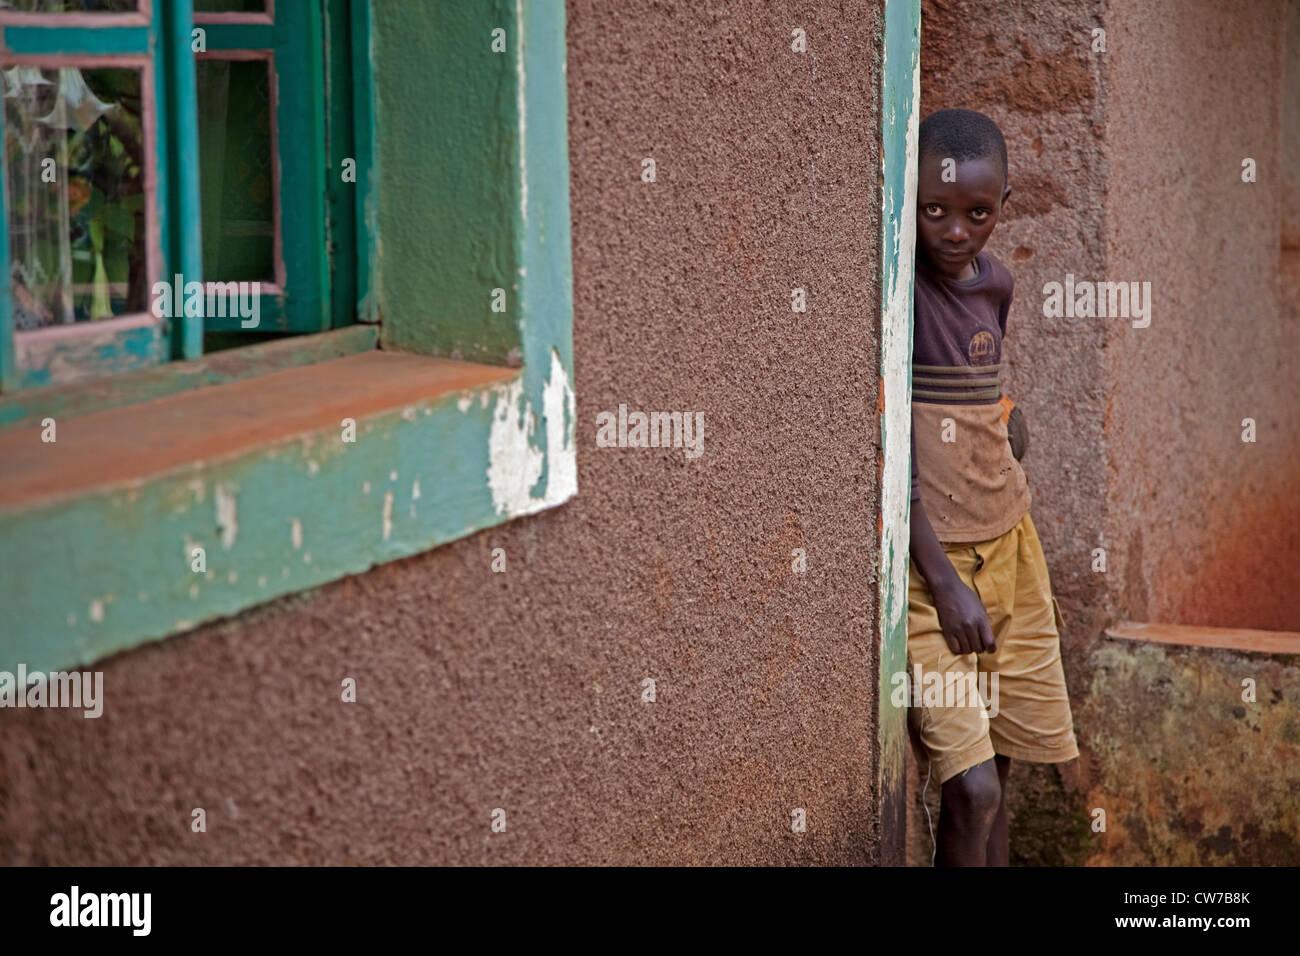 Garçon debout à l'entrée, du Burundi, Gitega Photo Stock